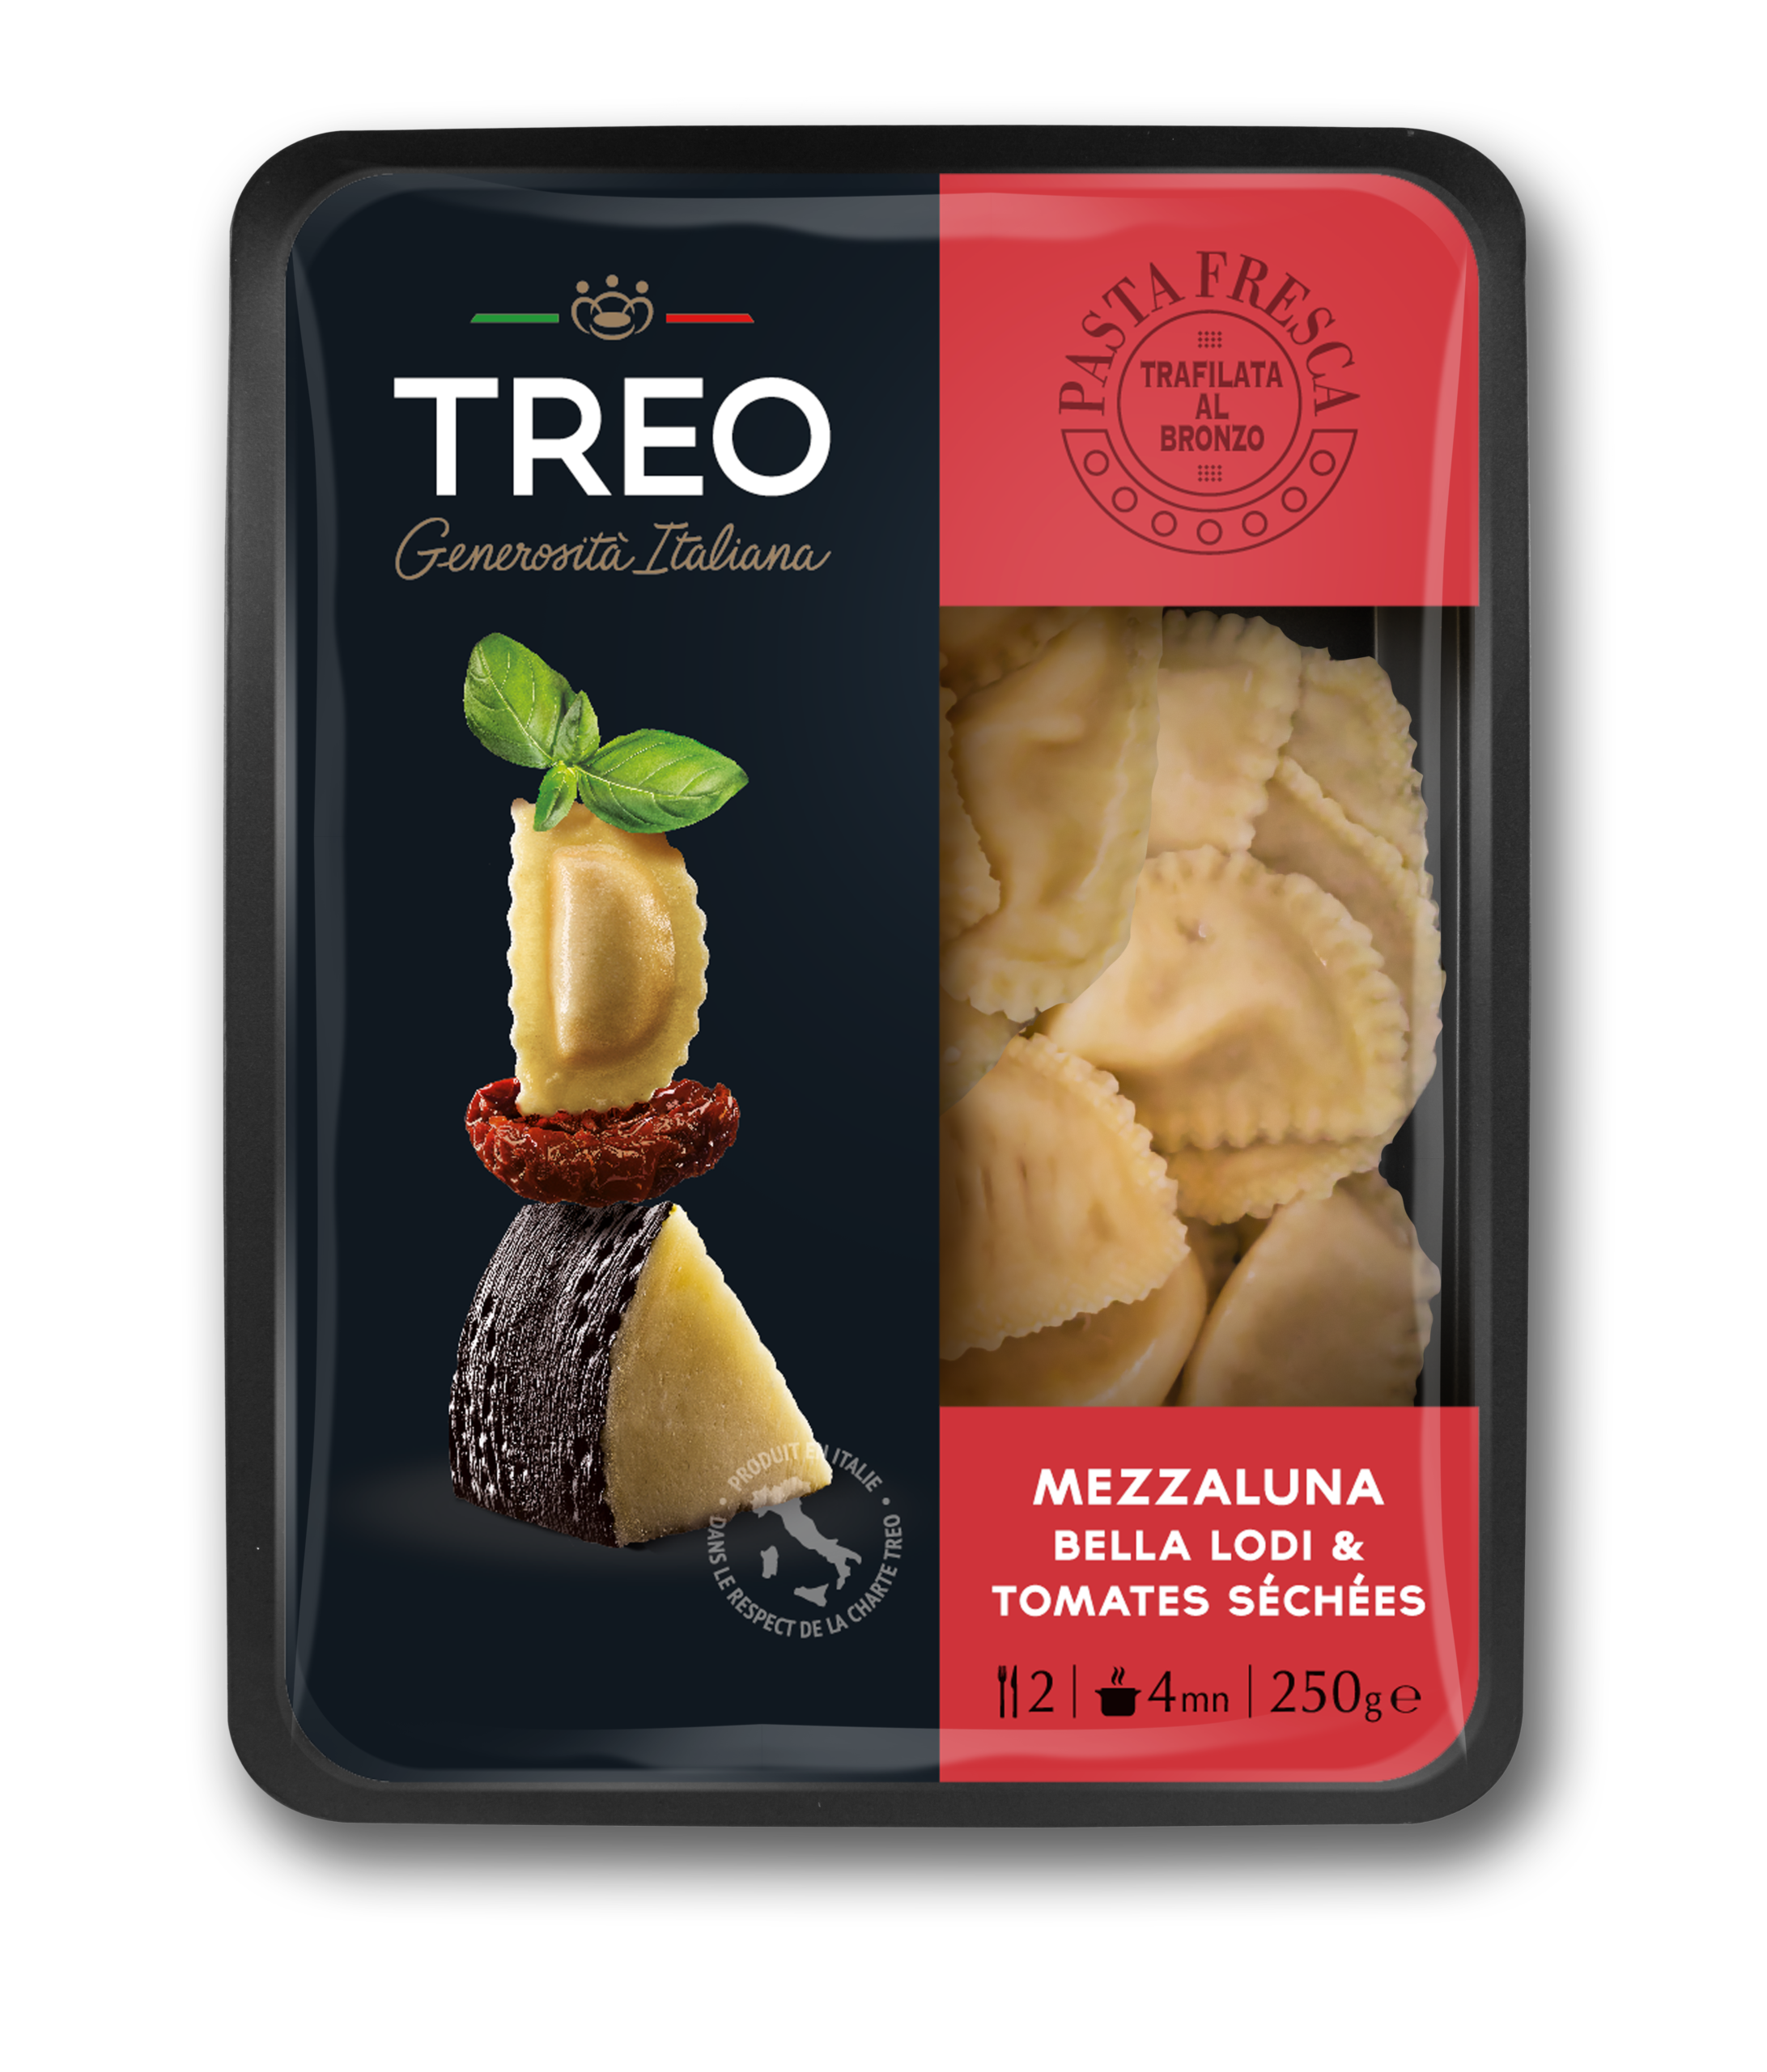 Mezzaluna Bella Lodi & tomates séchées